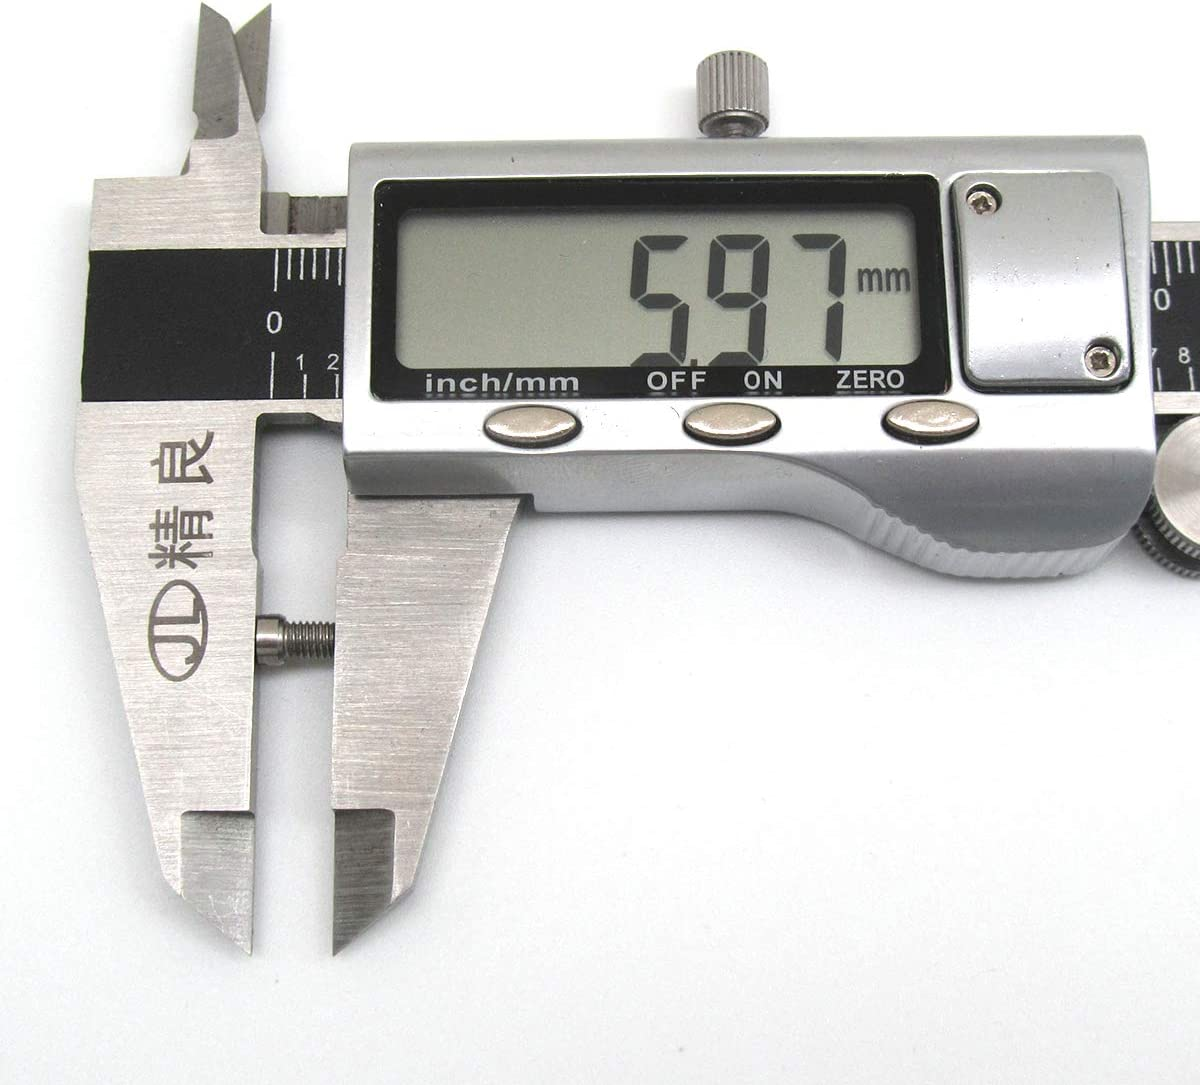 10 PCS Screws for Singer 29K 71 73 Needle Clamping Screws #237F KUNPENG